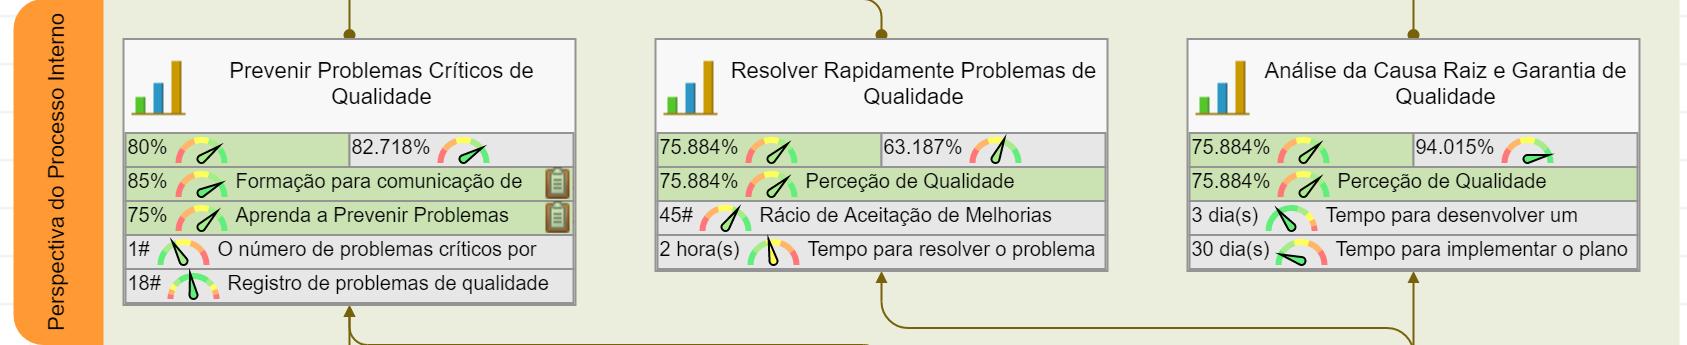 Scorecard de qualidade – perspectiva interna